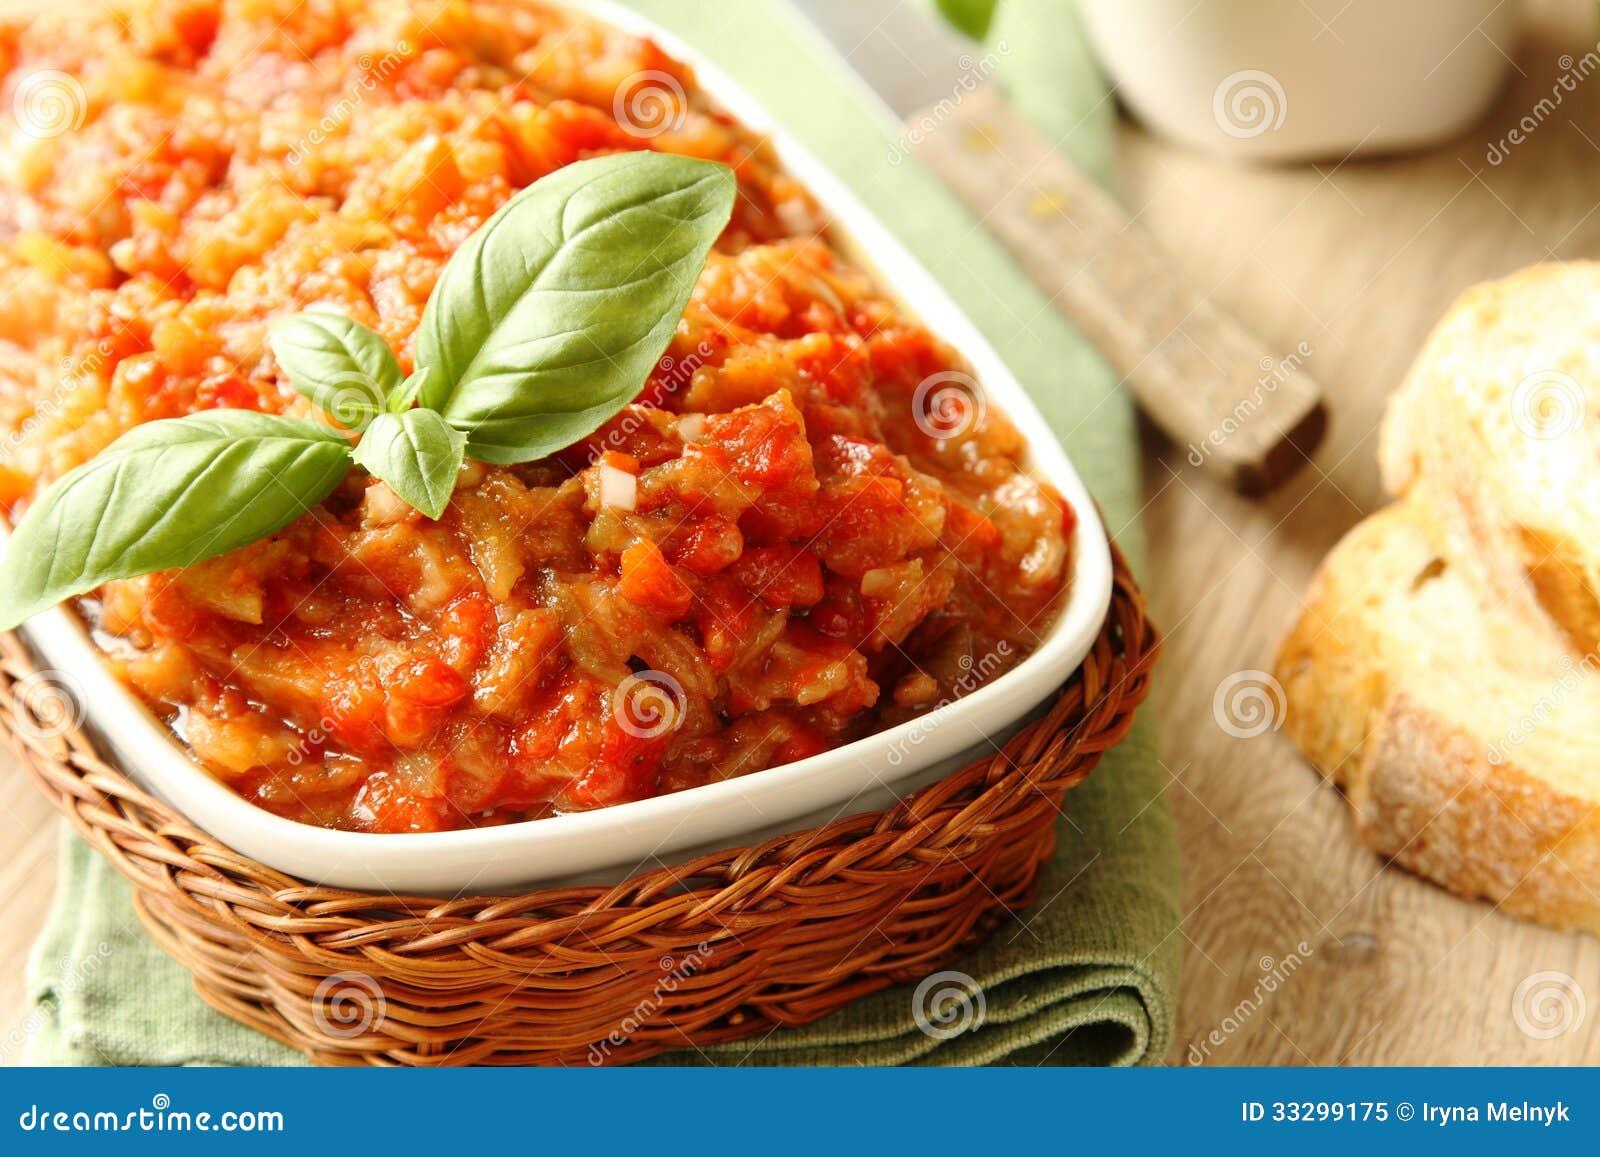 Salade d 39 aubergine caviar dans la cuvette nourriture for Cuisine ukrainienne